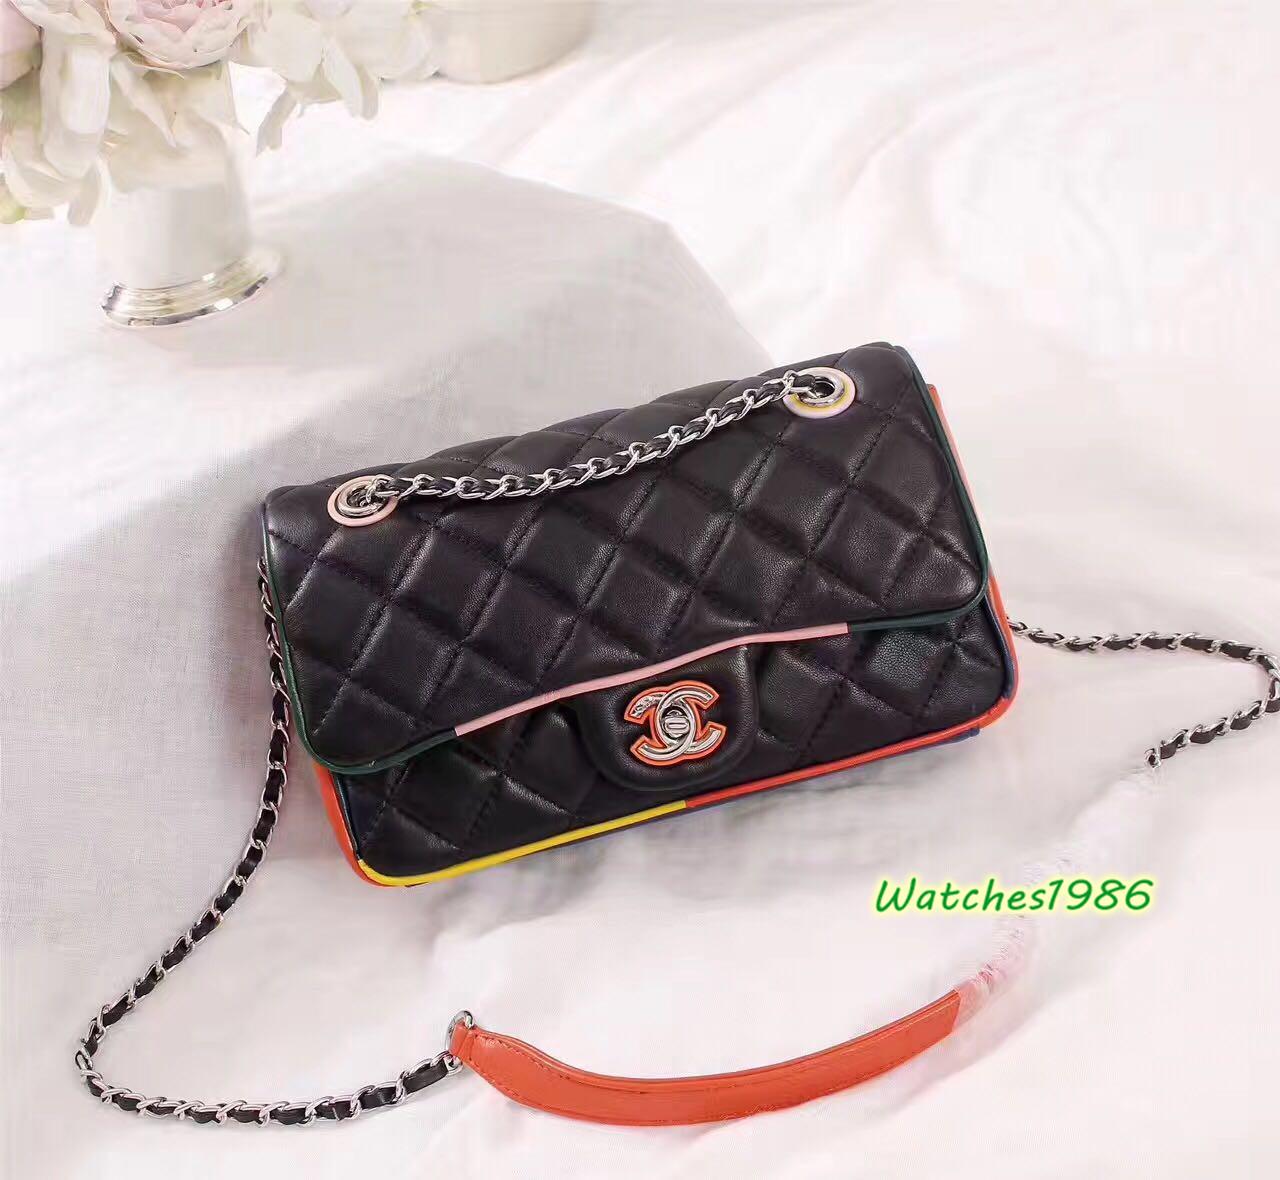 2017 latest Chanel purse replica handbag online for sale